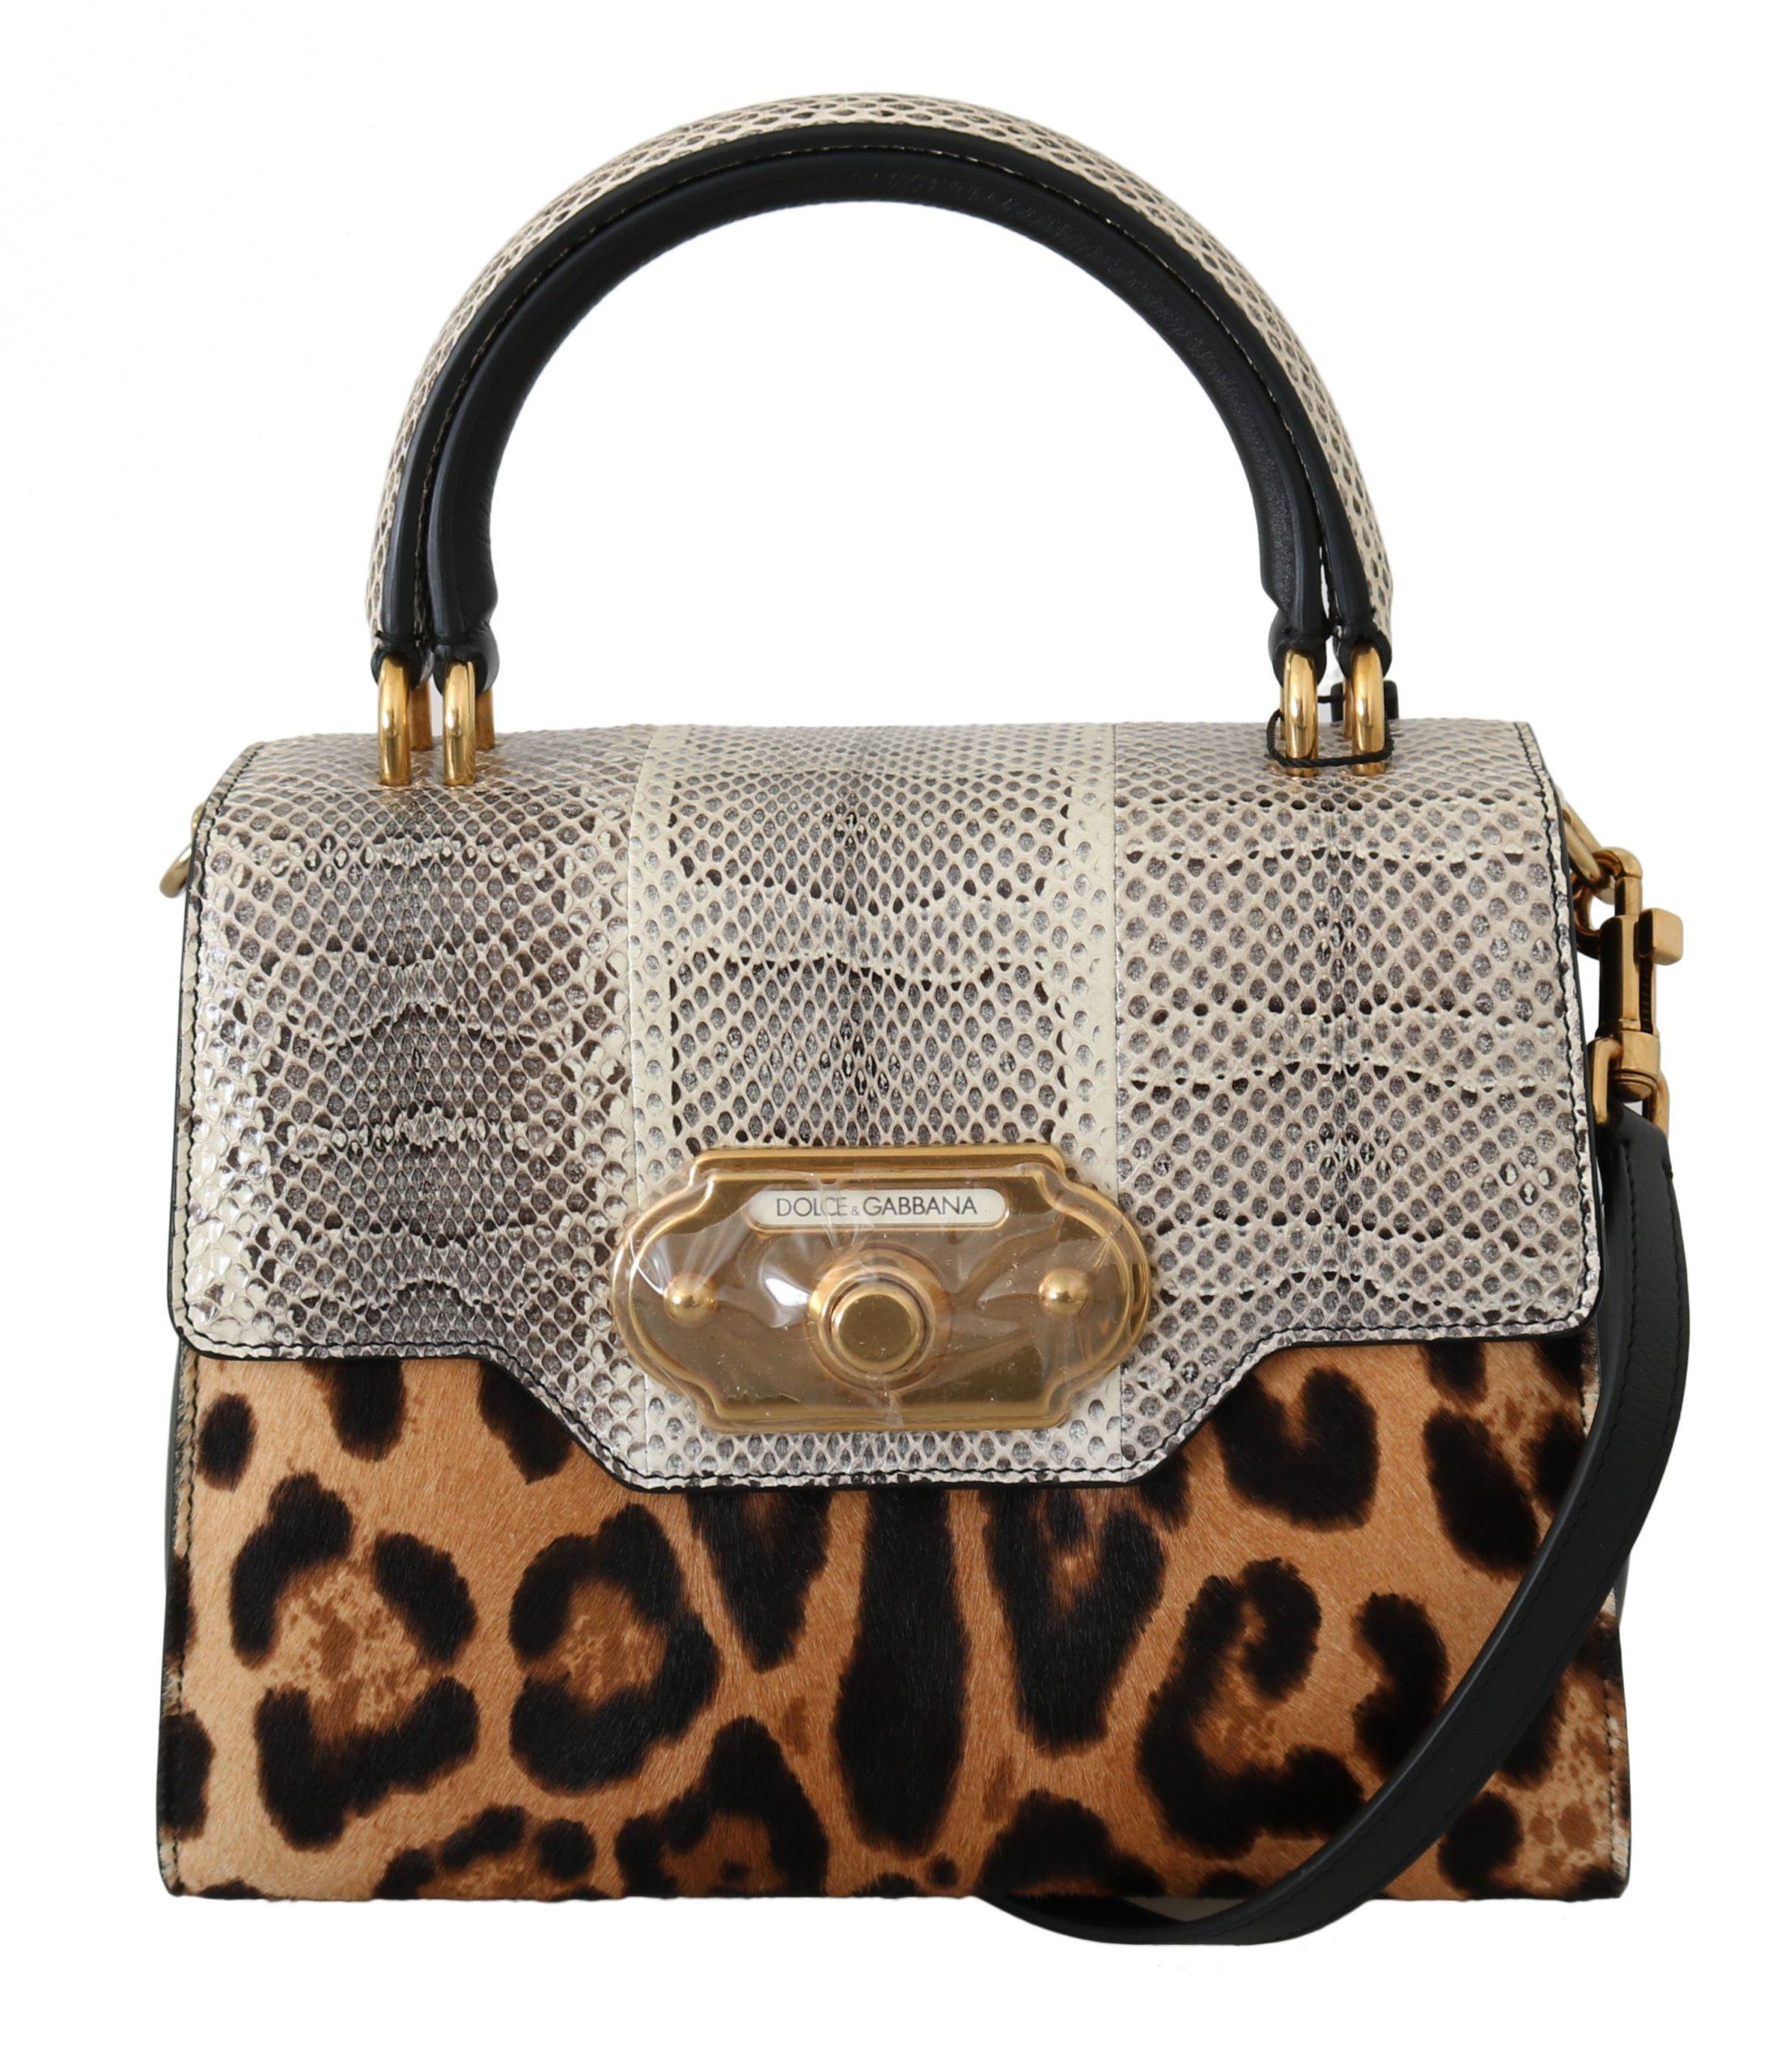 Dolce & Gabbana Women's Leopard Snakeskin Leopard Crossbody Bag Brown VA8846